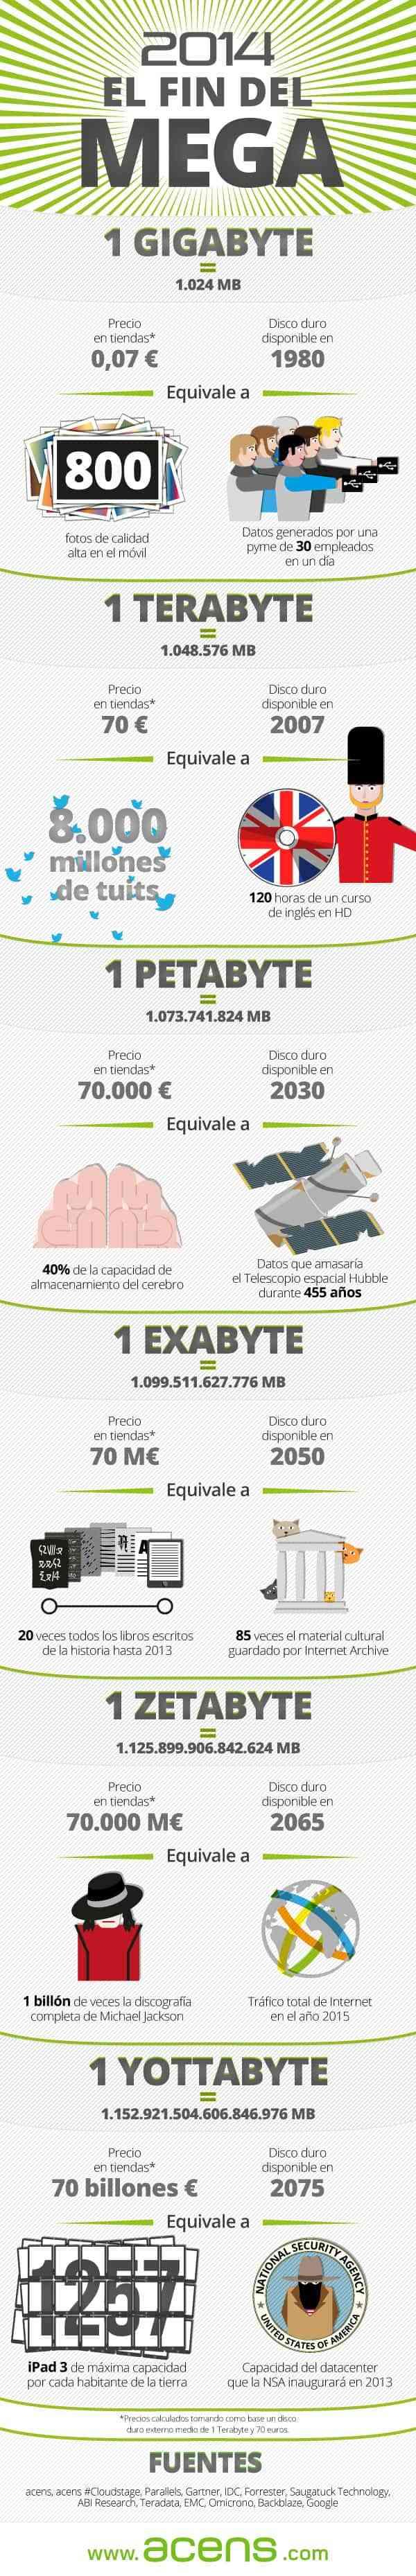 el fin de megabyte en 2104